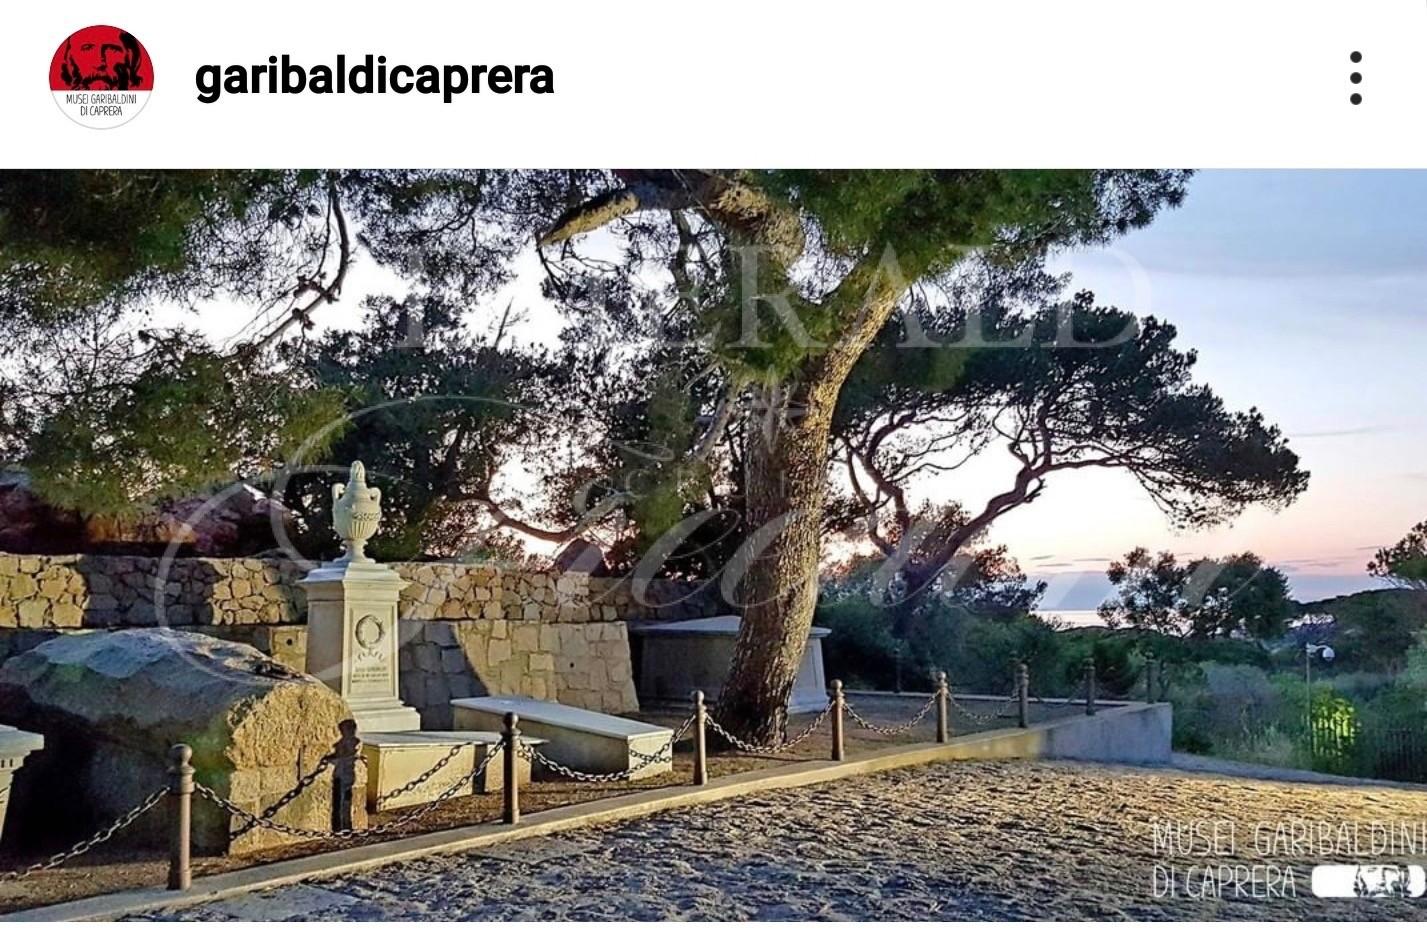 Garibaldi house in the island of Caprera Sardinia Italy